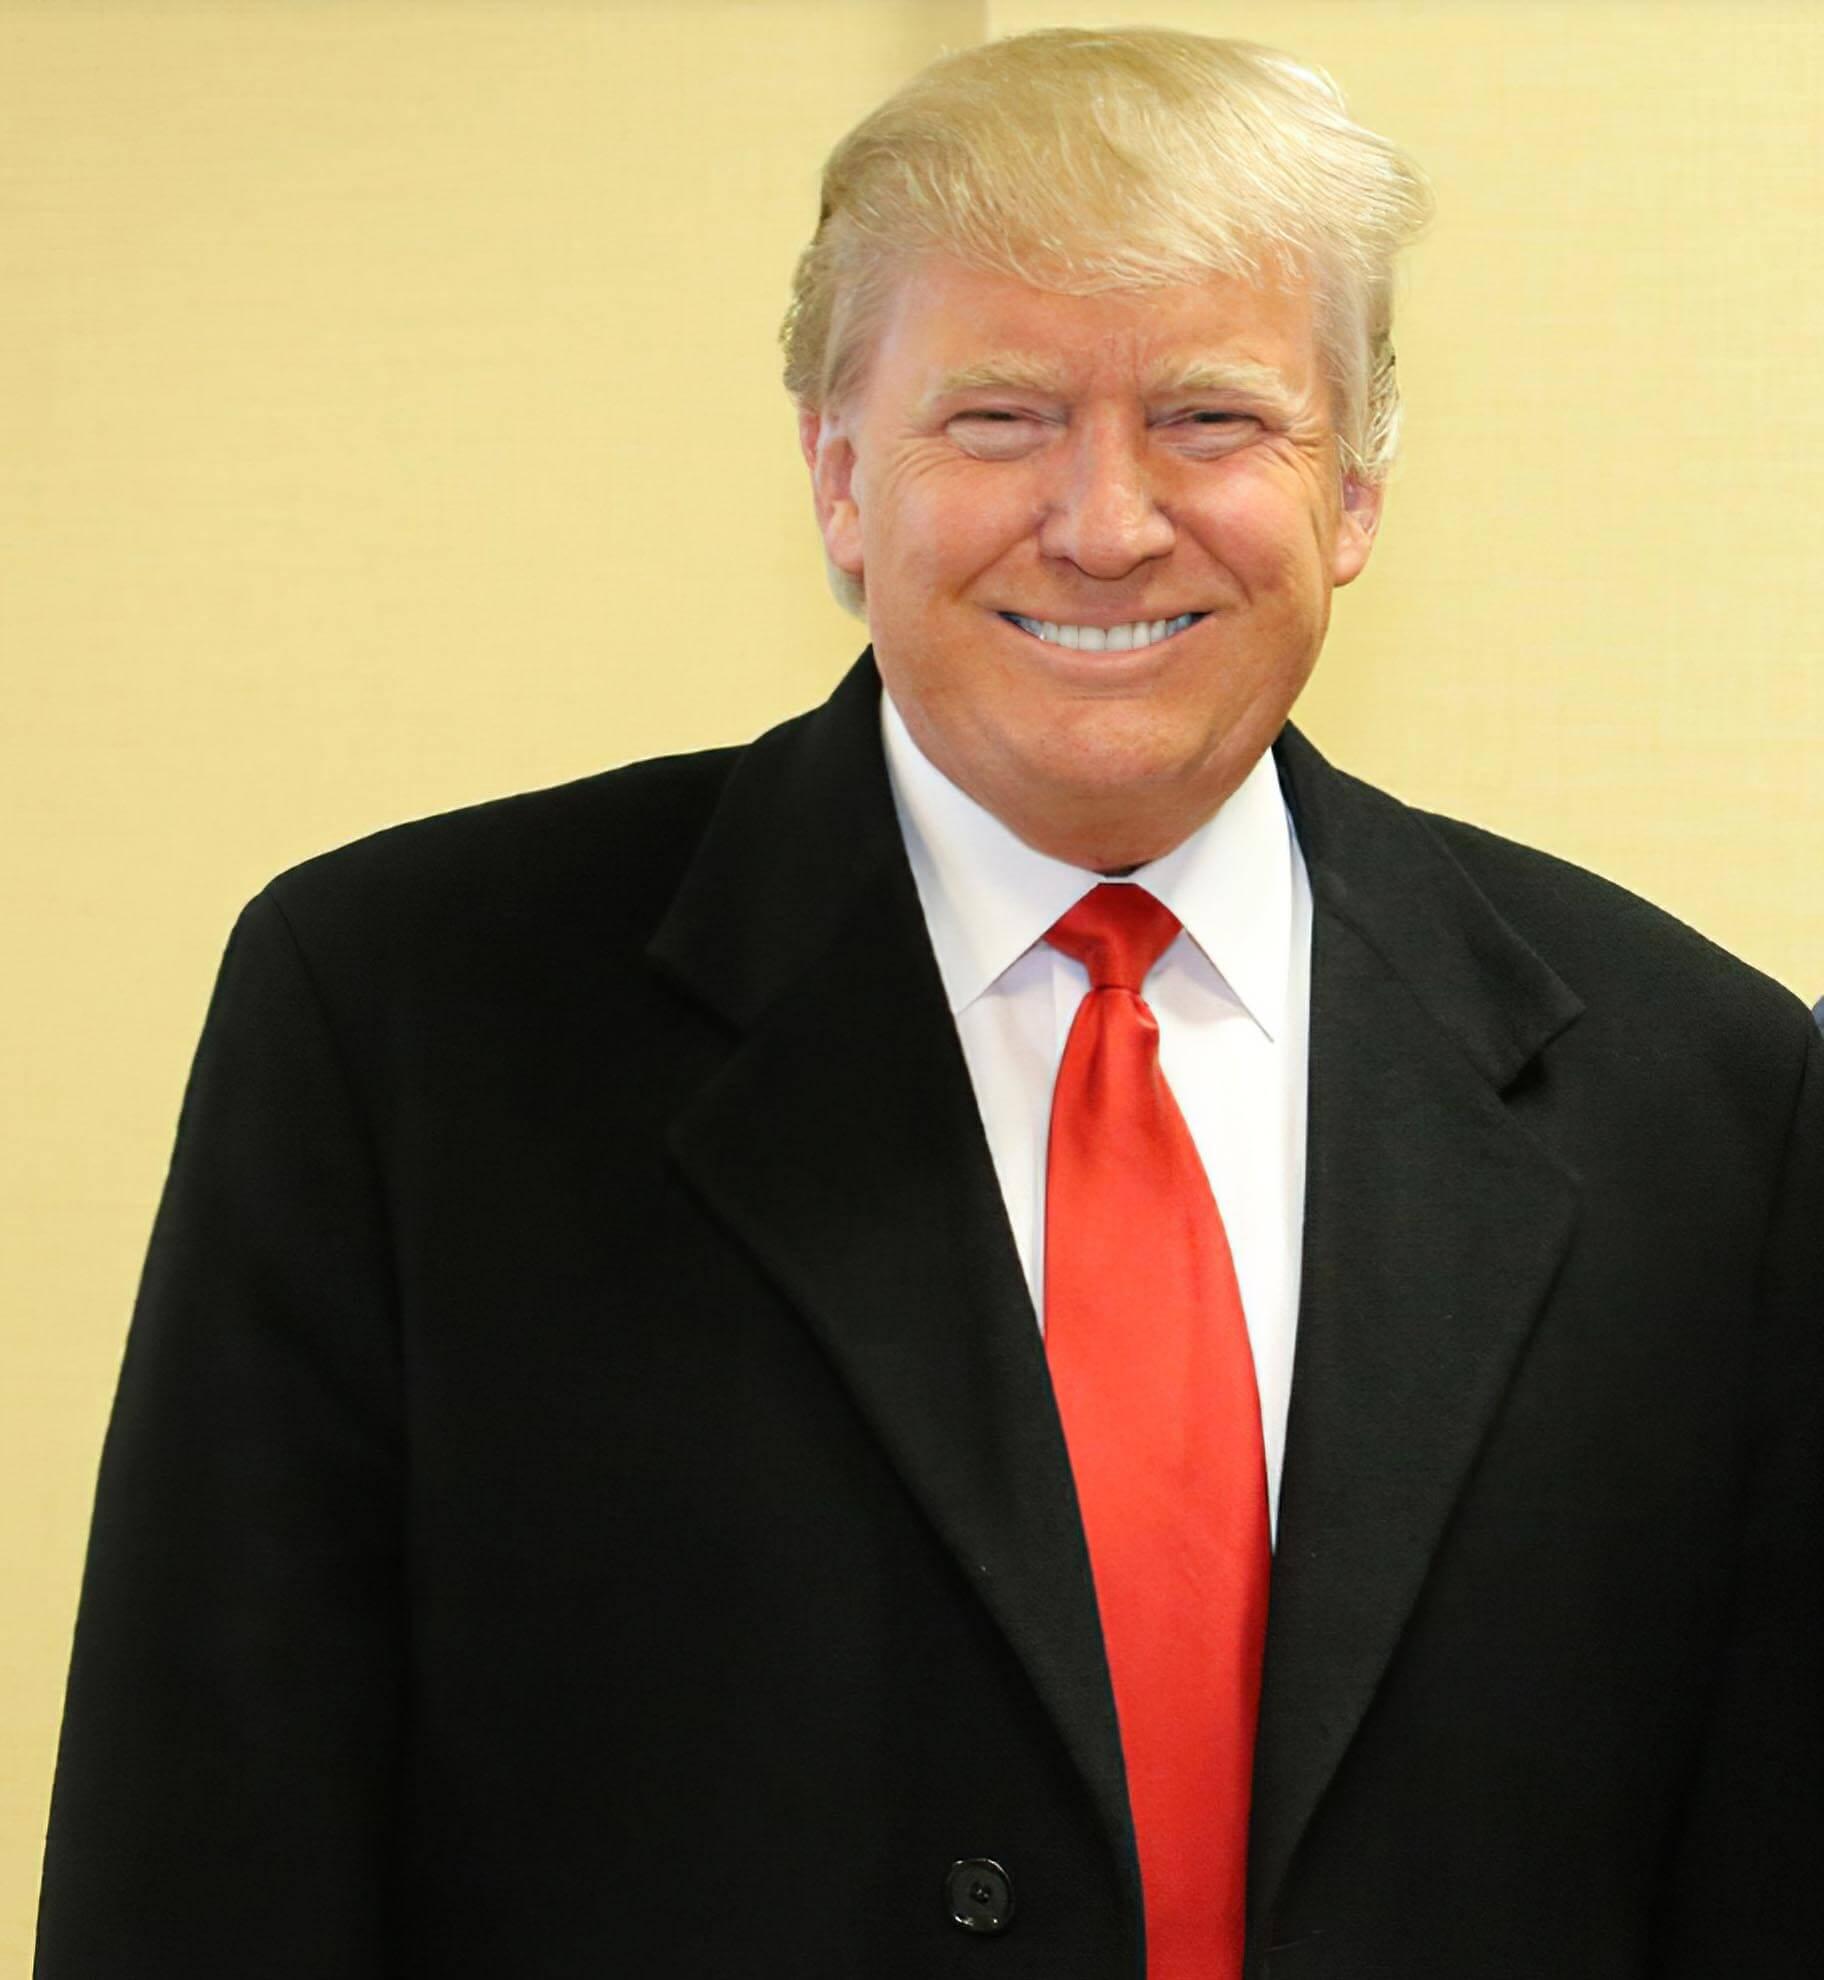 Donald Trump Potus 2